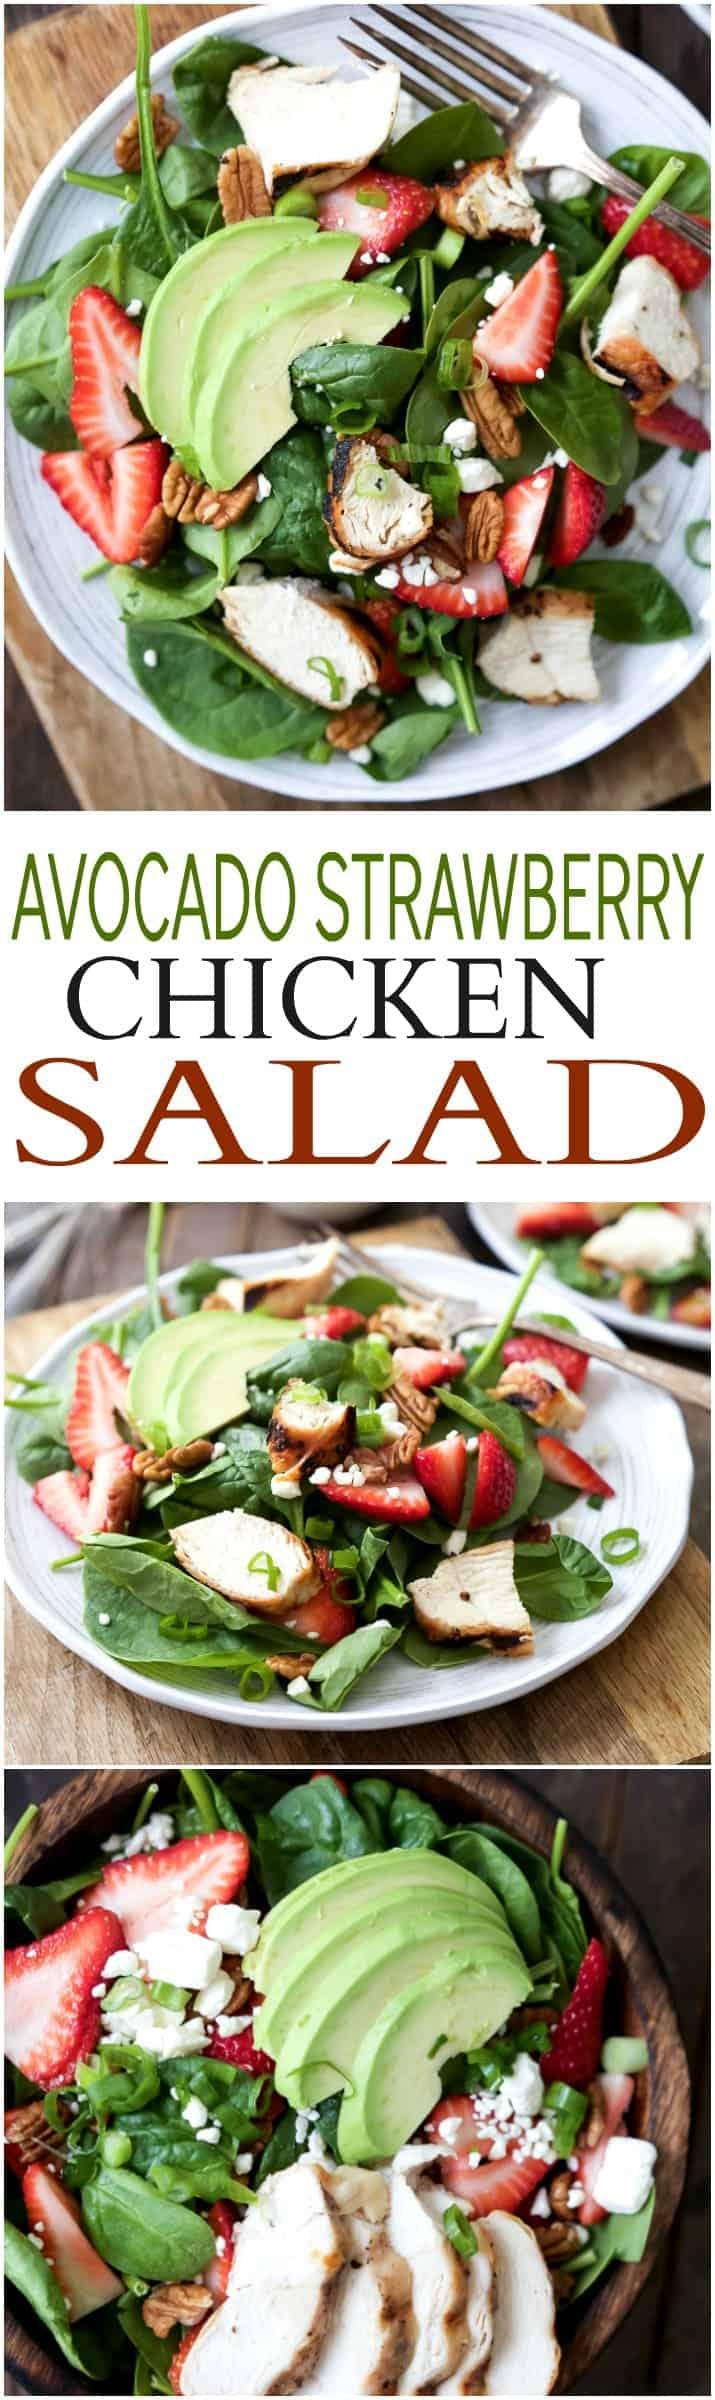 Strawberry Avocado Chicken Salad Recipe + DIY Balsamic Vinaigrette